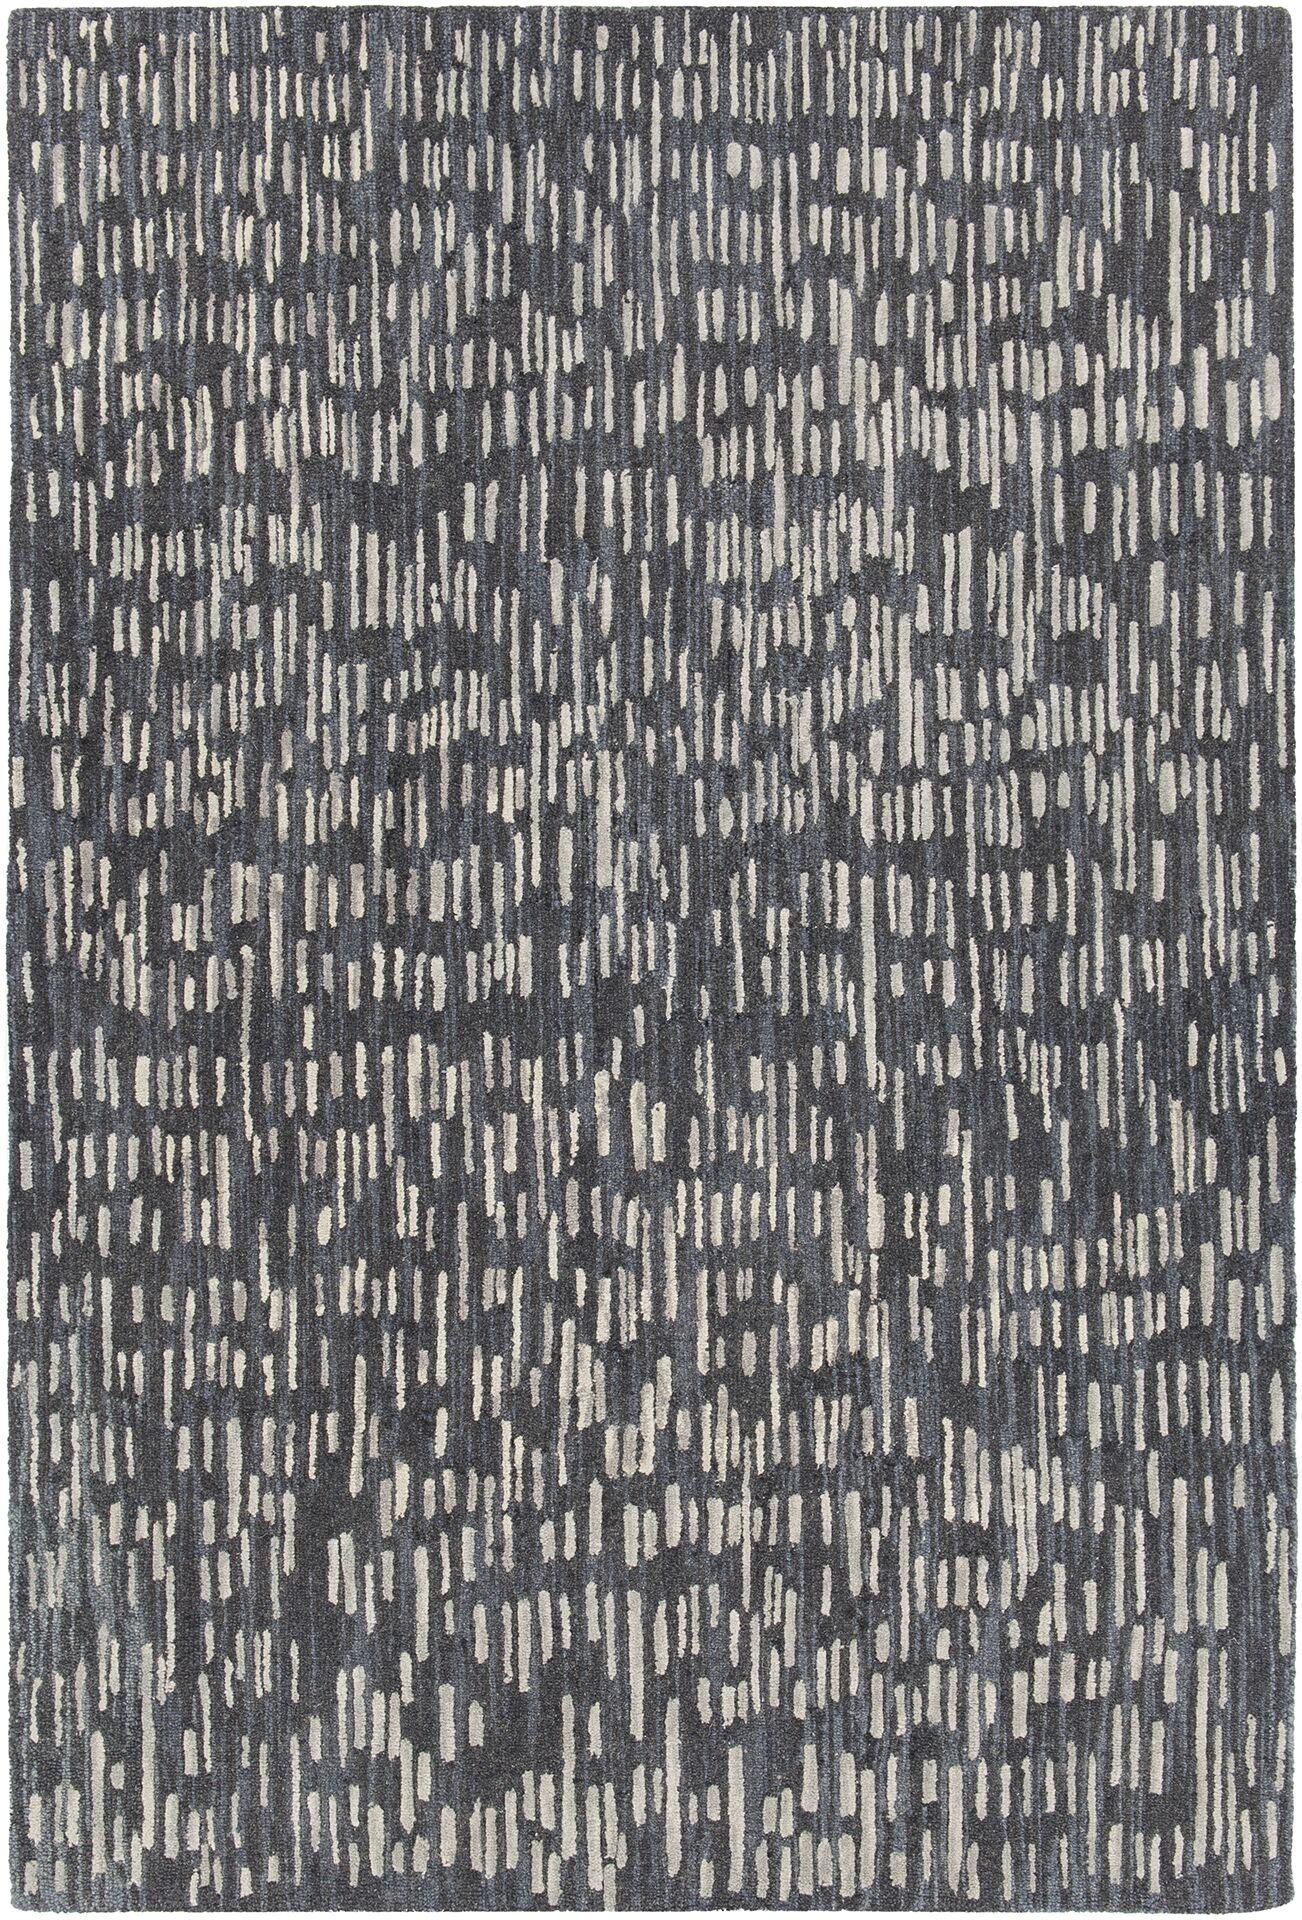 Kirtley Hand-Woven Black/Gray Area Rug Rug Size: 7'9